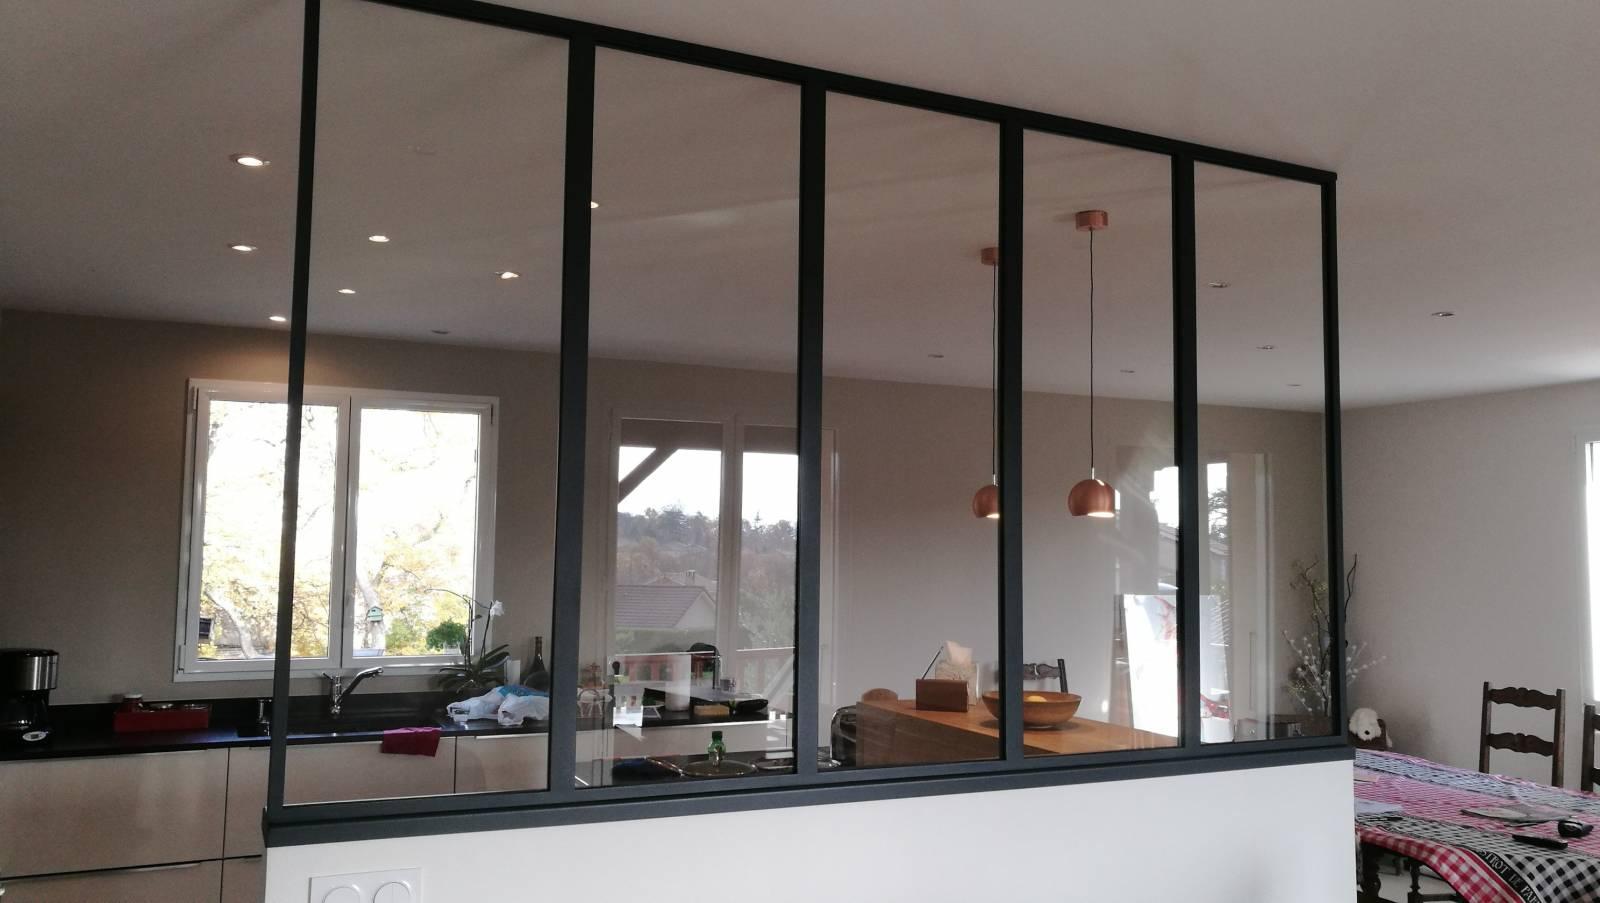 verri re type atelier install e vernaison. Black Bedroom Furniture Sets. Home Design Ideas